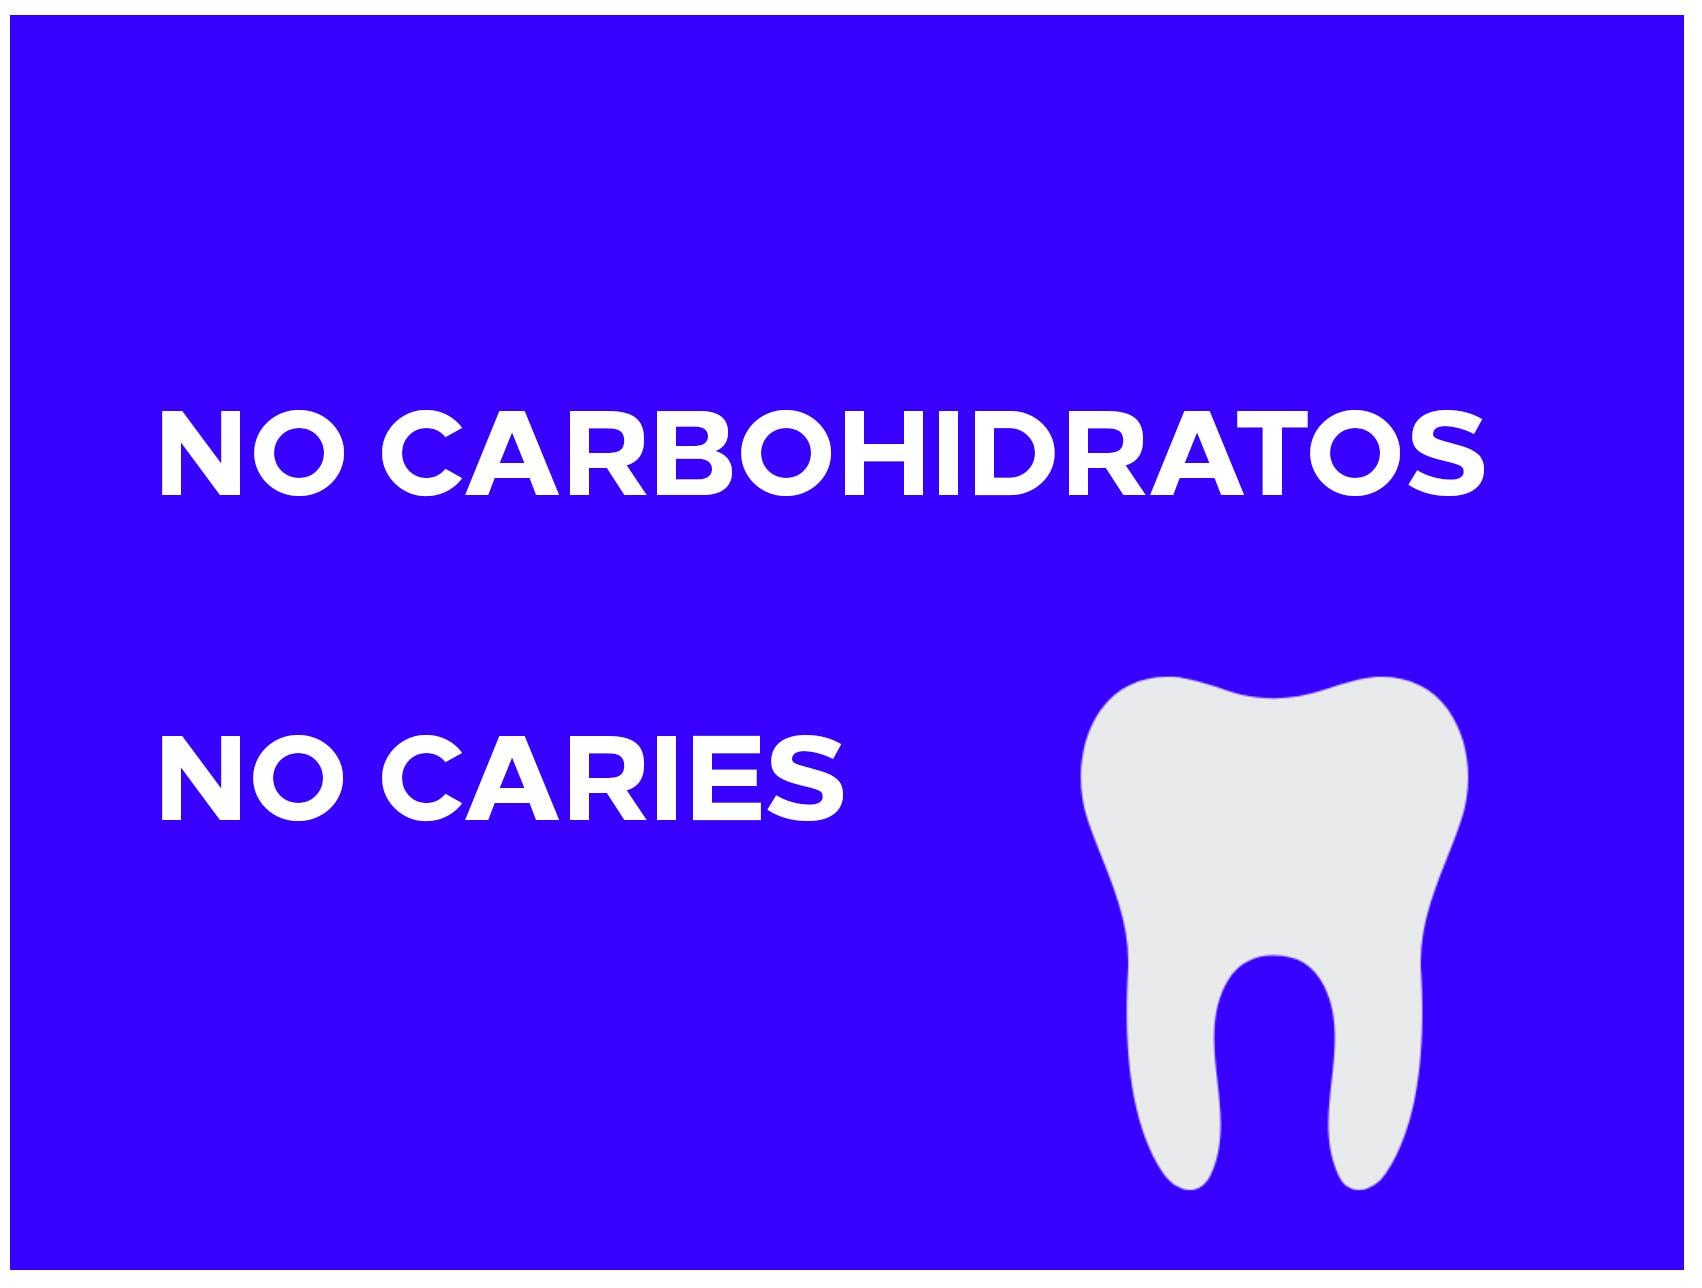 No carbs no caries